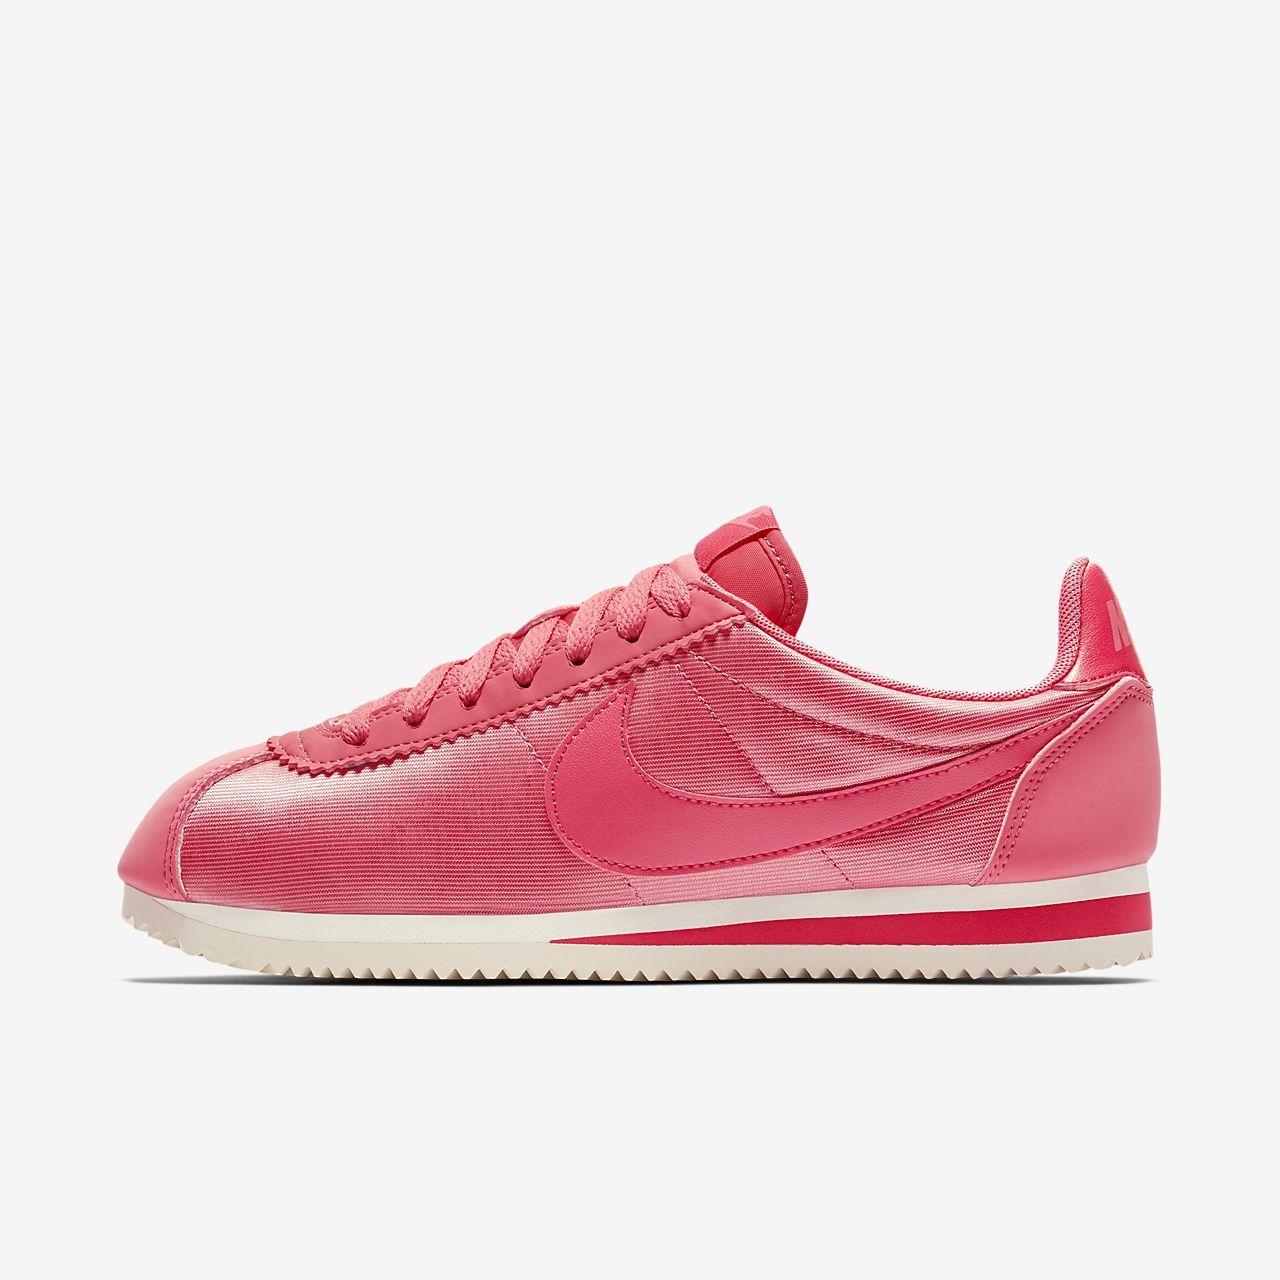 Nike Classic Cortez Nylon Damenschuh   schuhe   Pinterest   Classic ... 01358fdf46